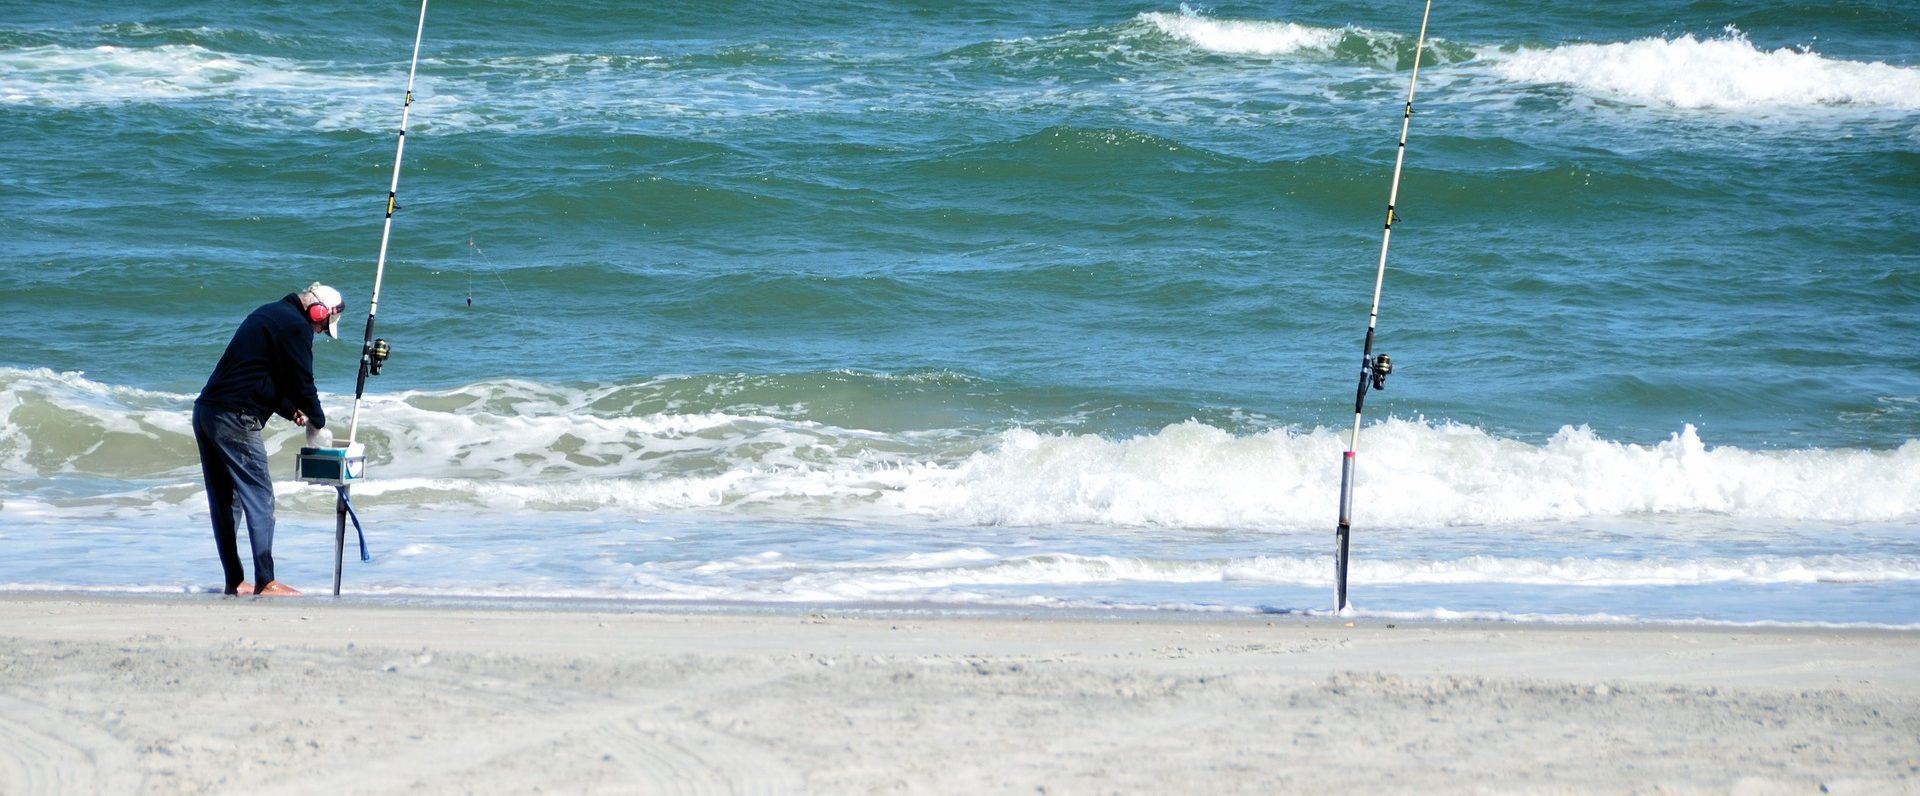 surf-fisherman-2069142_1920